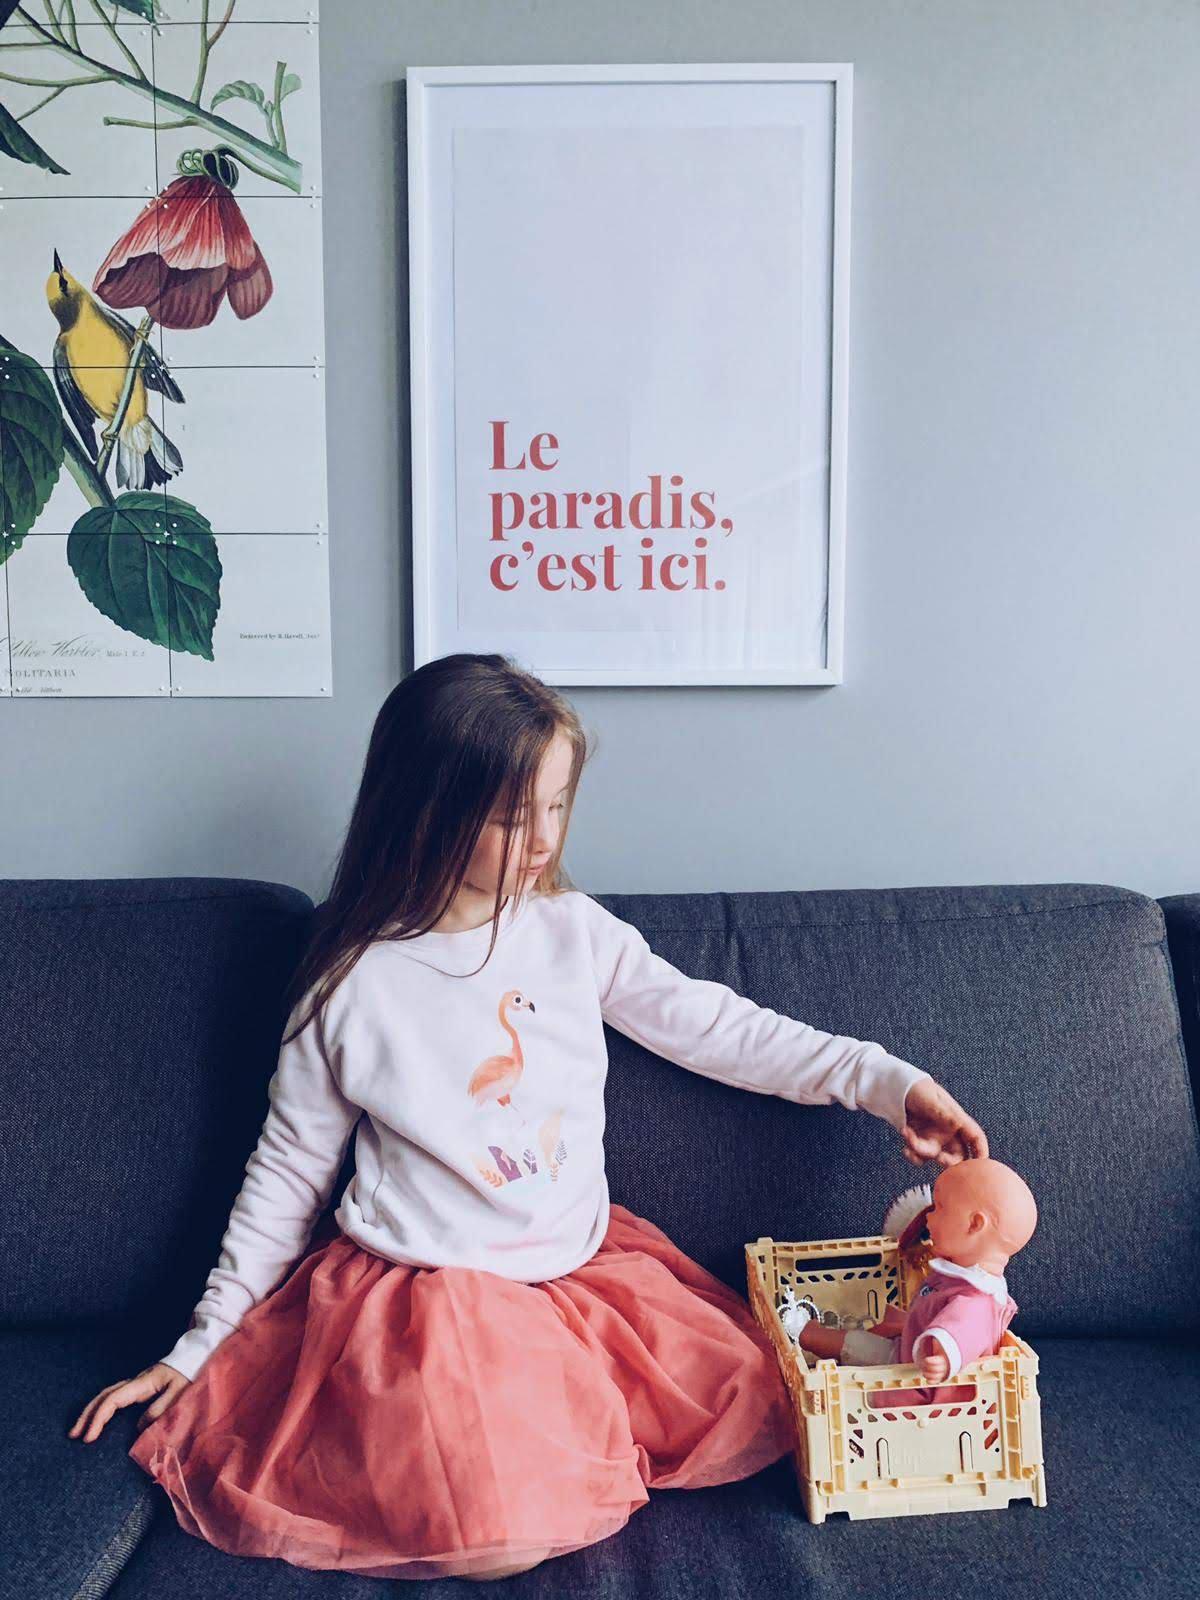 A2 poster Le paradis, c'est ici - poster by mangos on monday